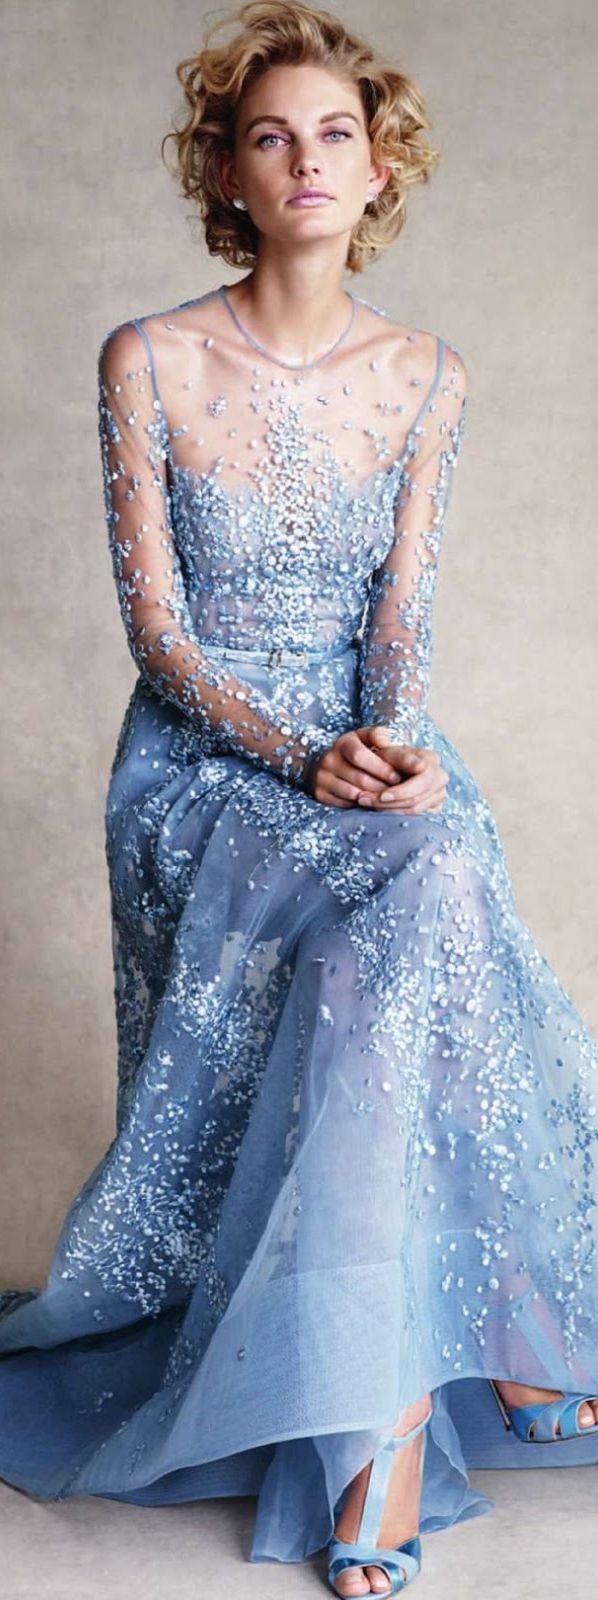 Lace wedding dress cheap december 2018 Patricia Van Der Vliet by Victor Demarchelier for Uk Harperus Bazaar